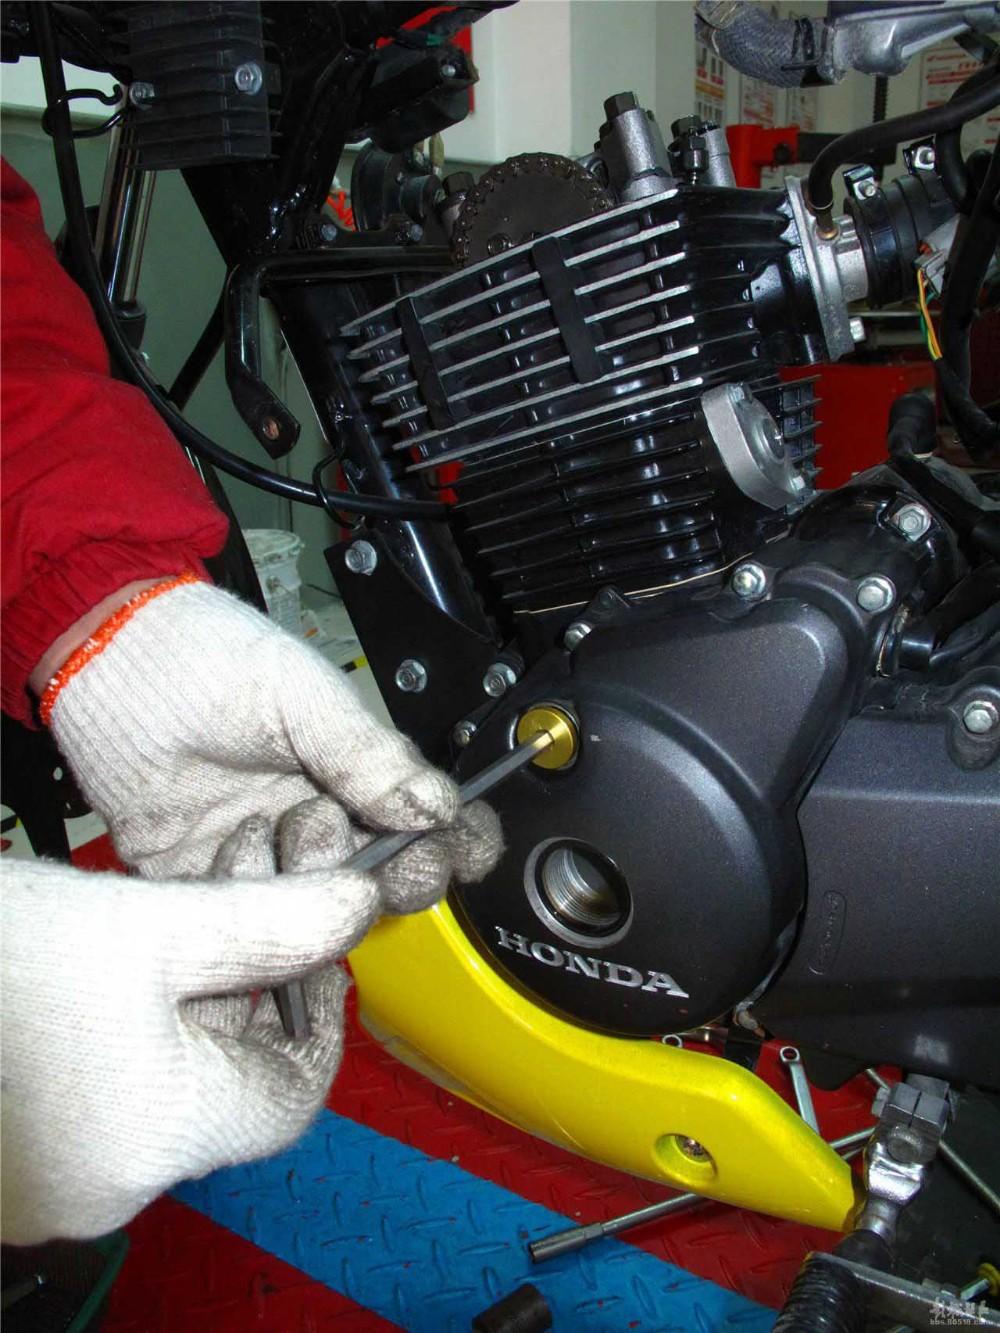 New 175CC 62MM Big Bore Kit for HONDA CBF125 Motorcycle Necessary modification, Free Shipping!